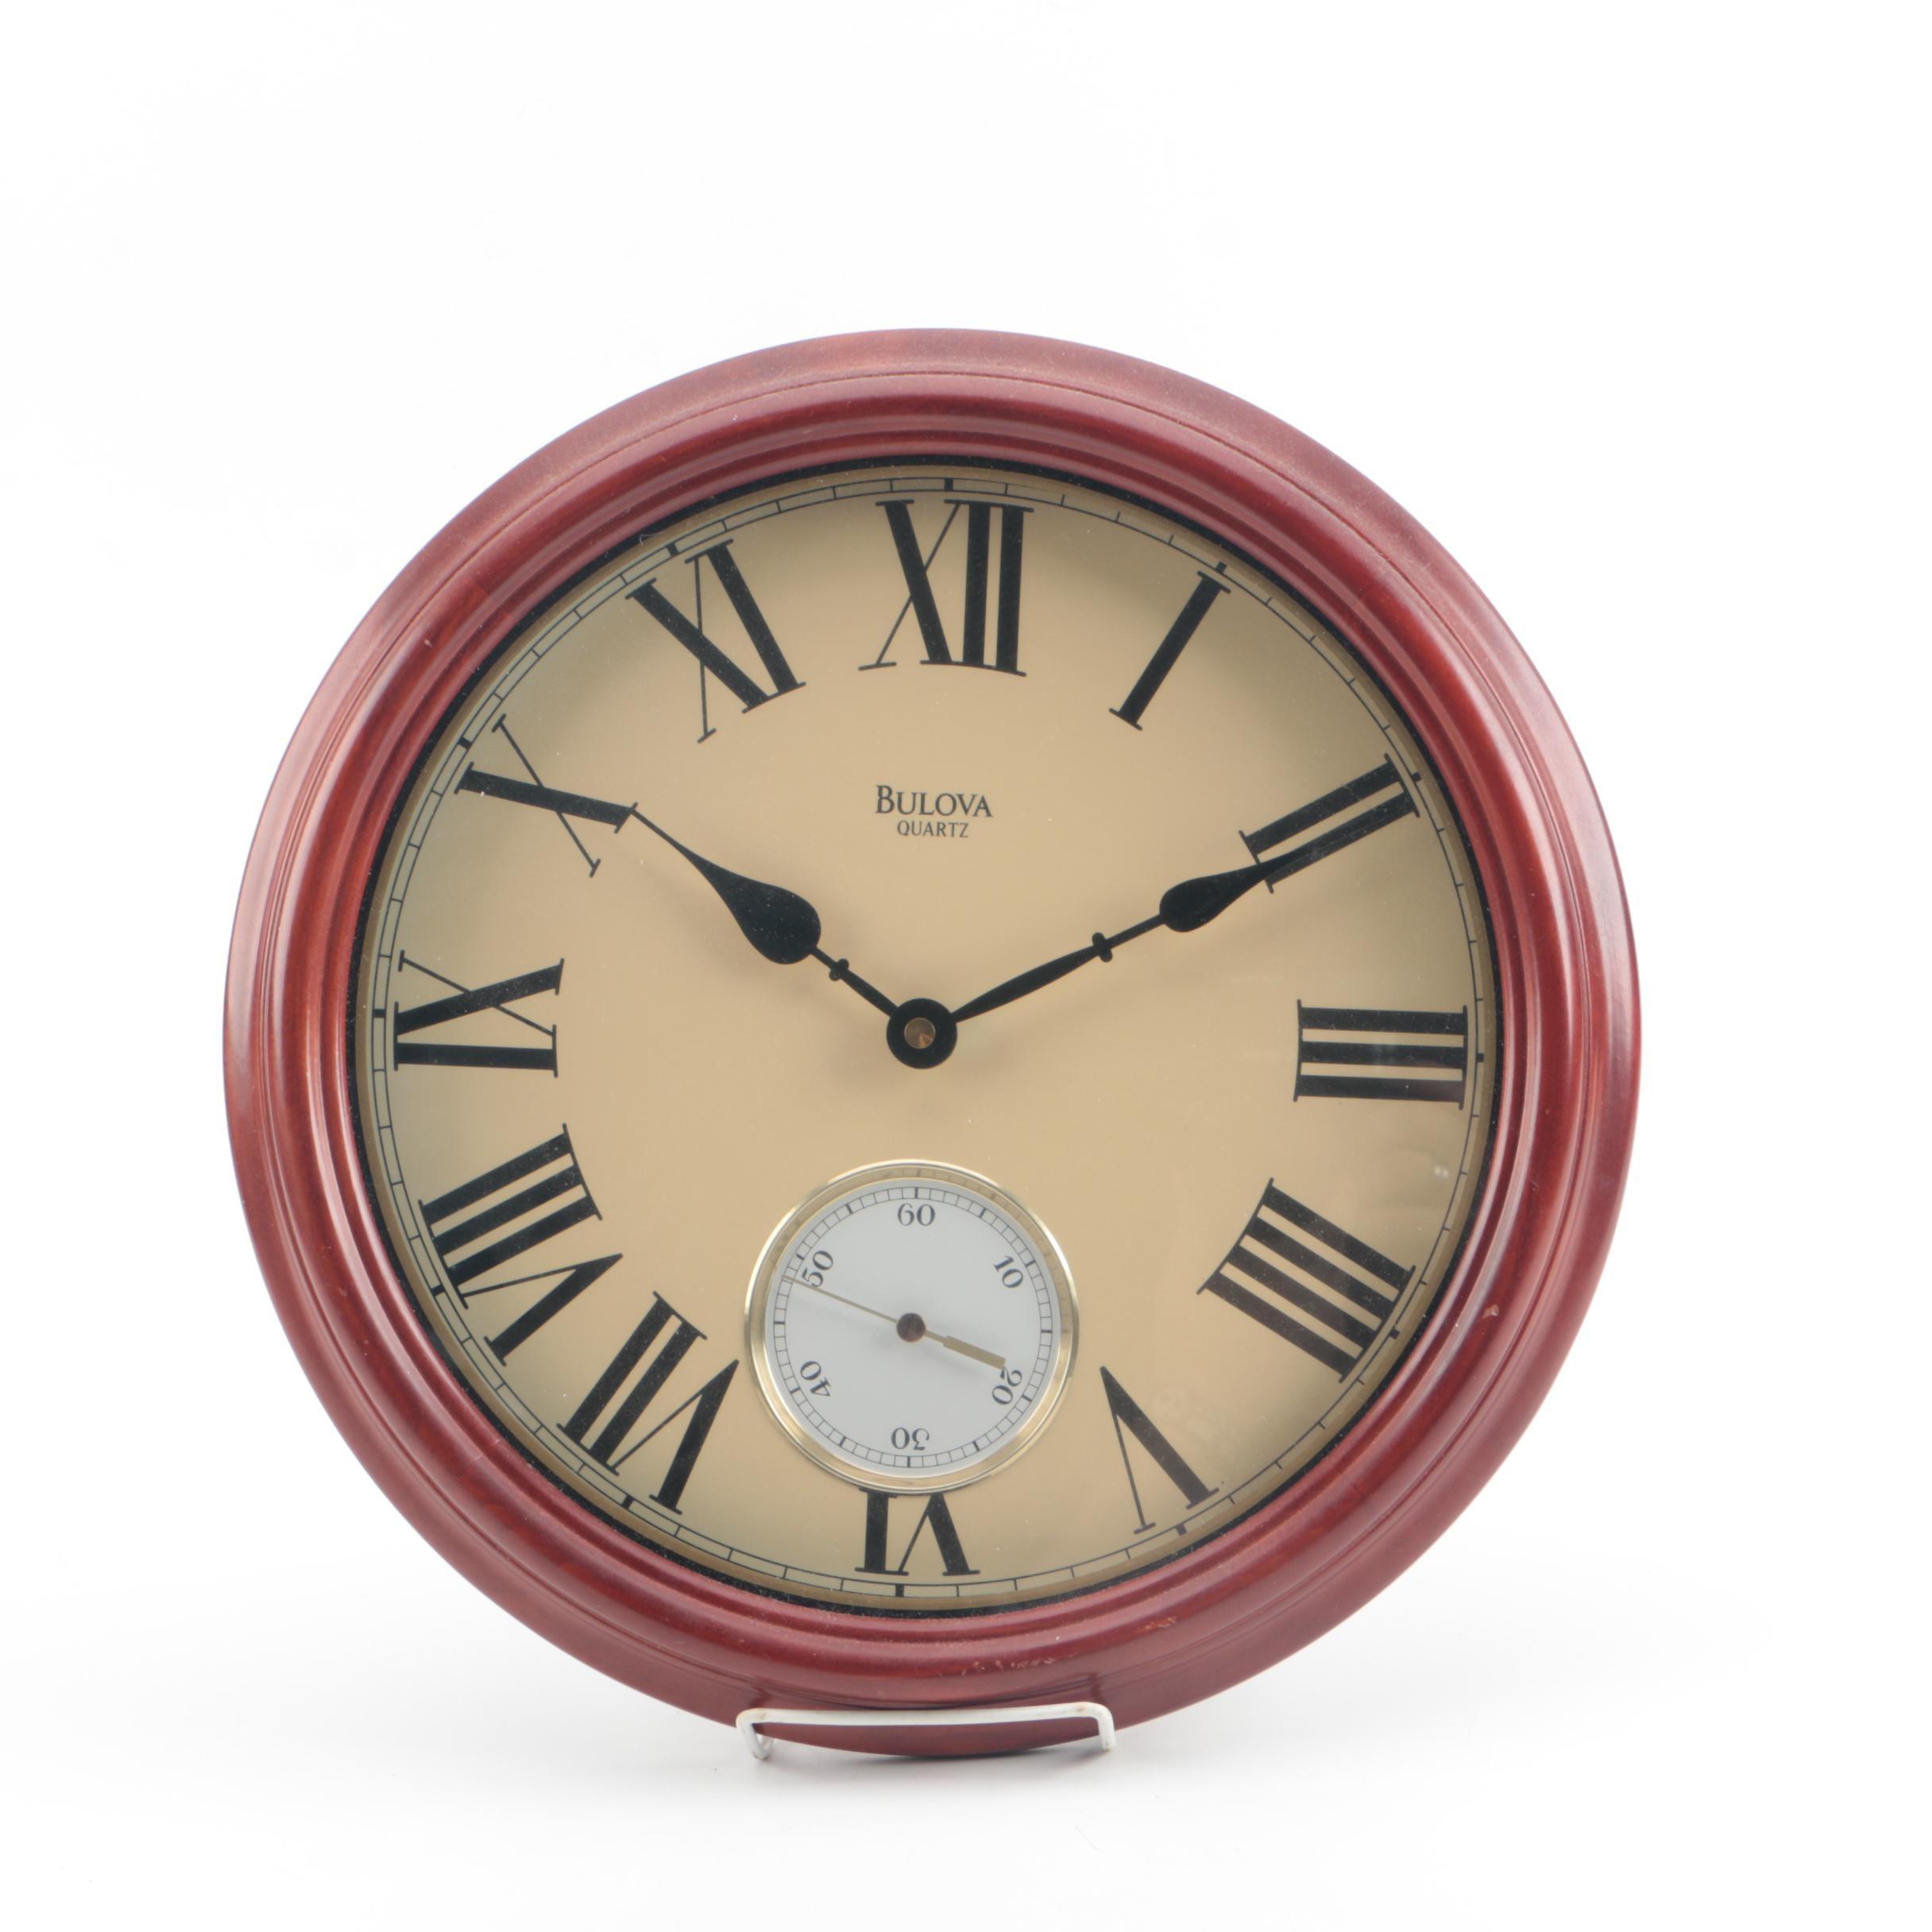 Bulova Quartz Wall Clock